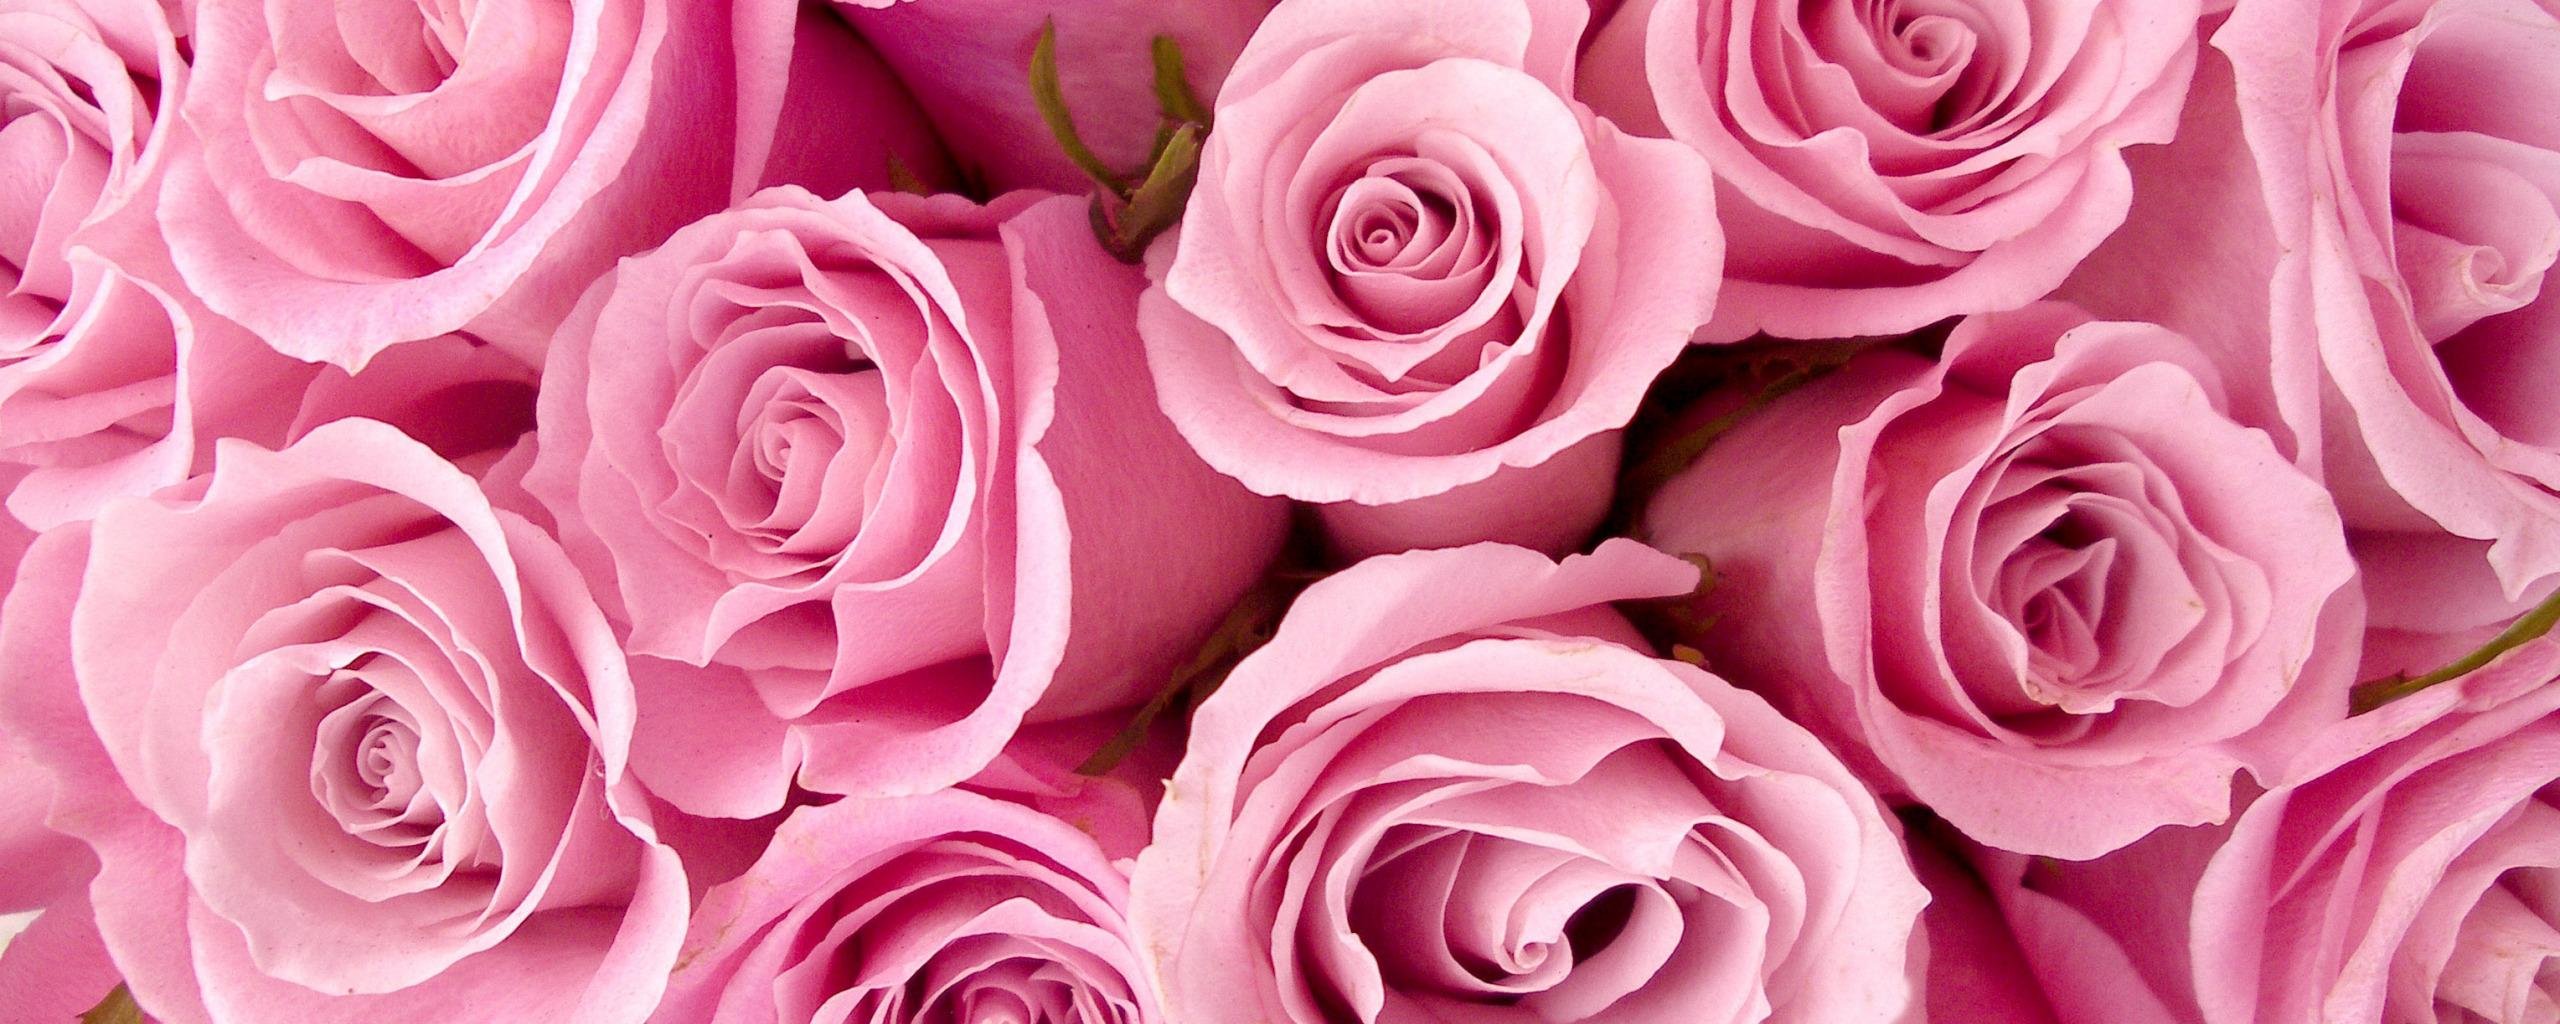 Картинки на обложки розы